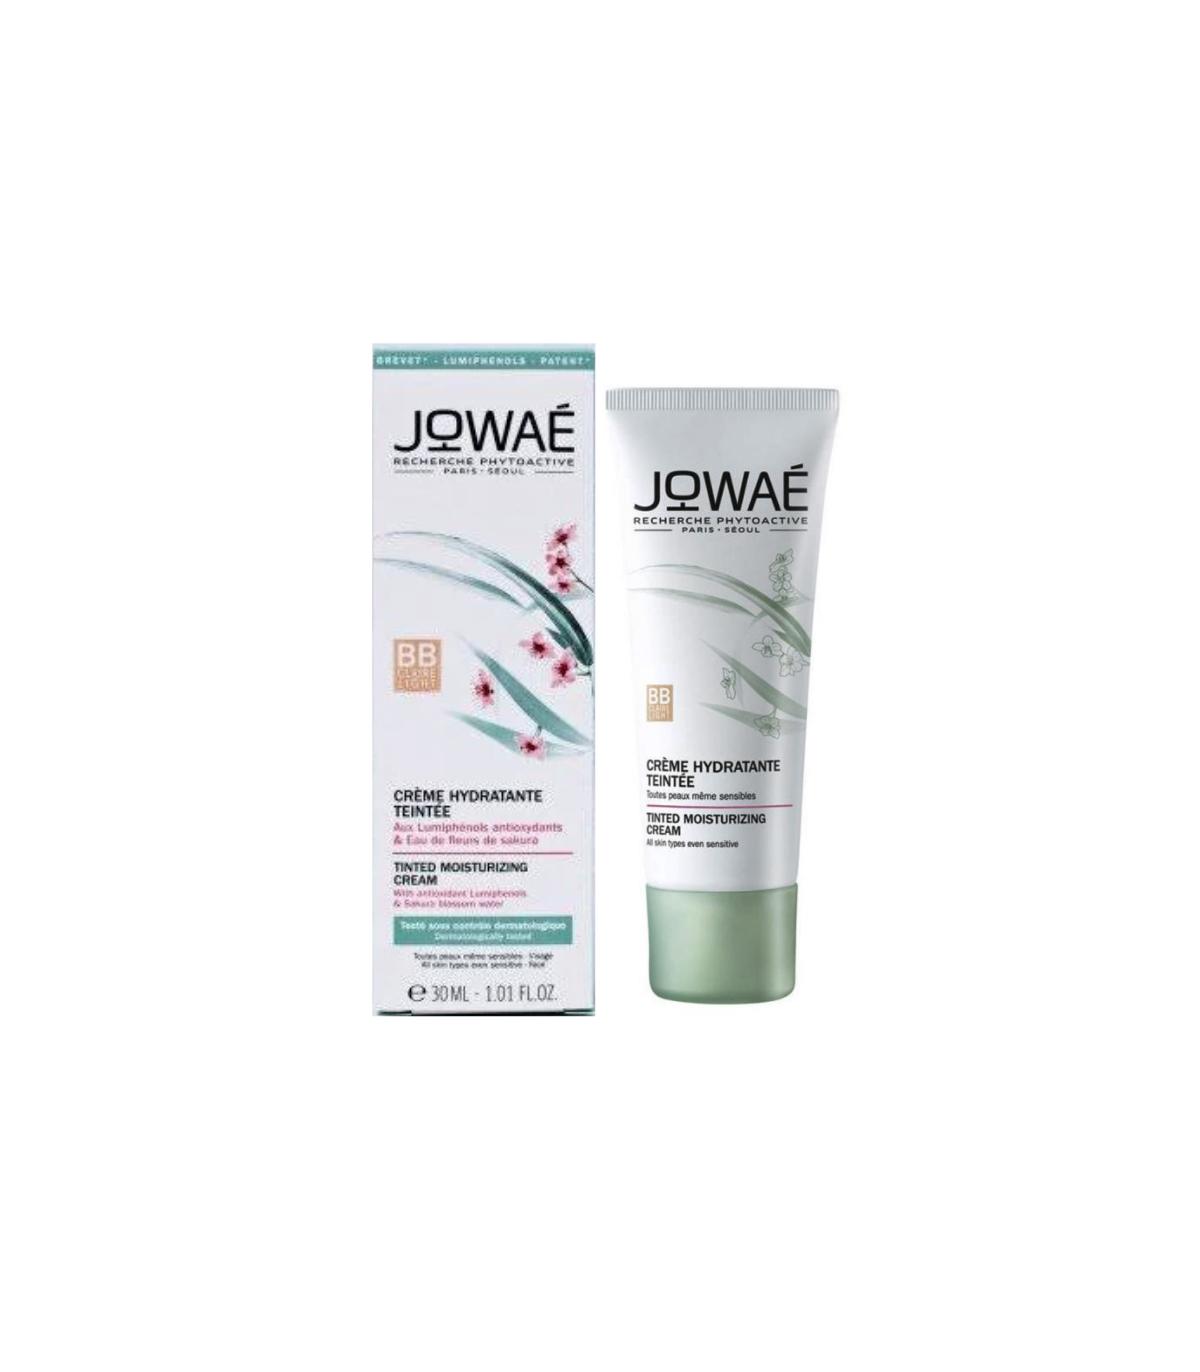 Farmacia Baricentro|JOWAE CREMA HIDRATANTE COLOR CLARO 30ML